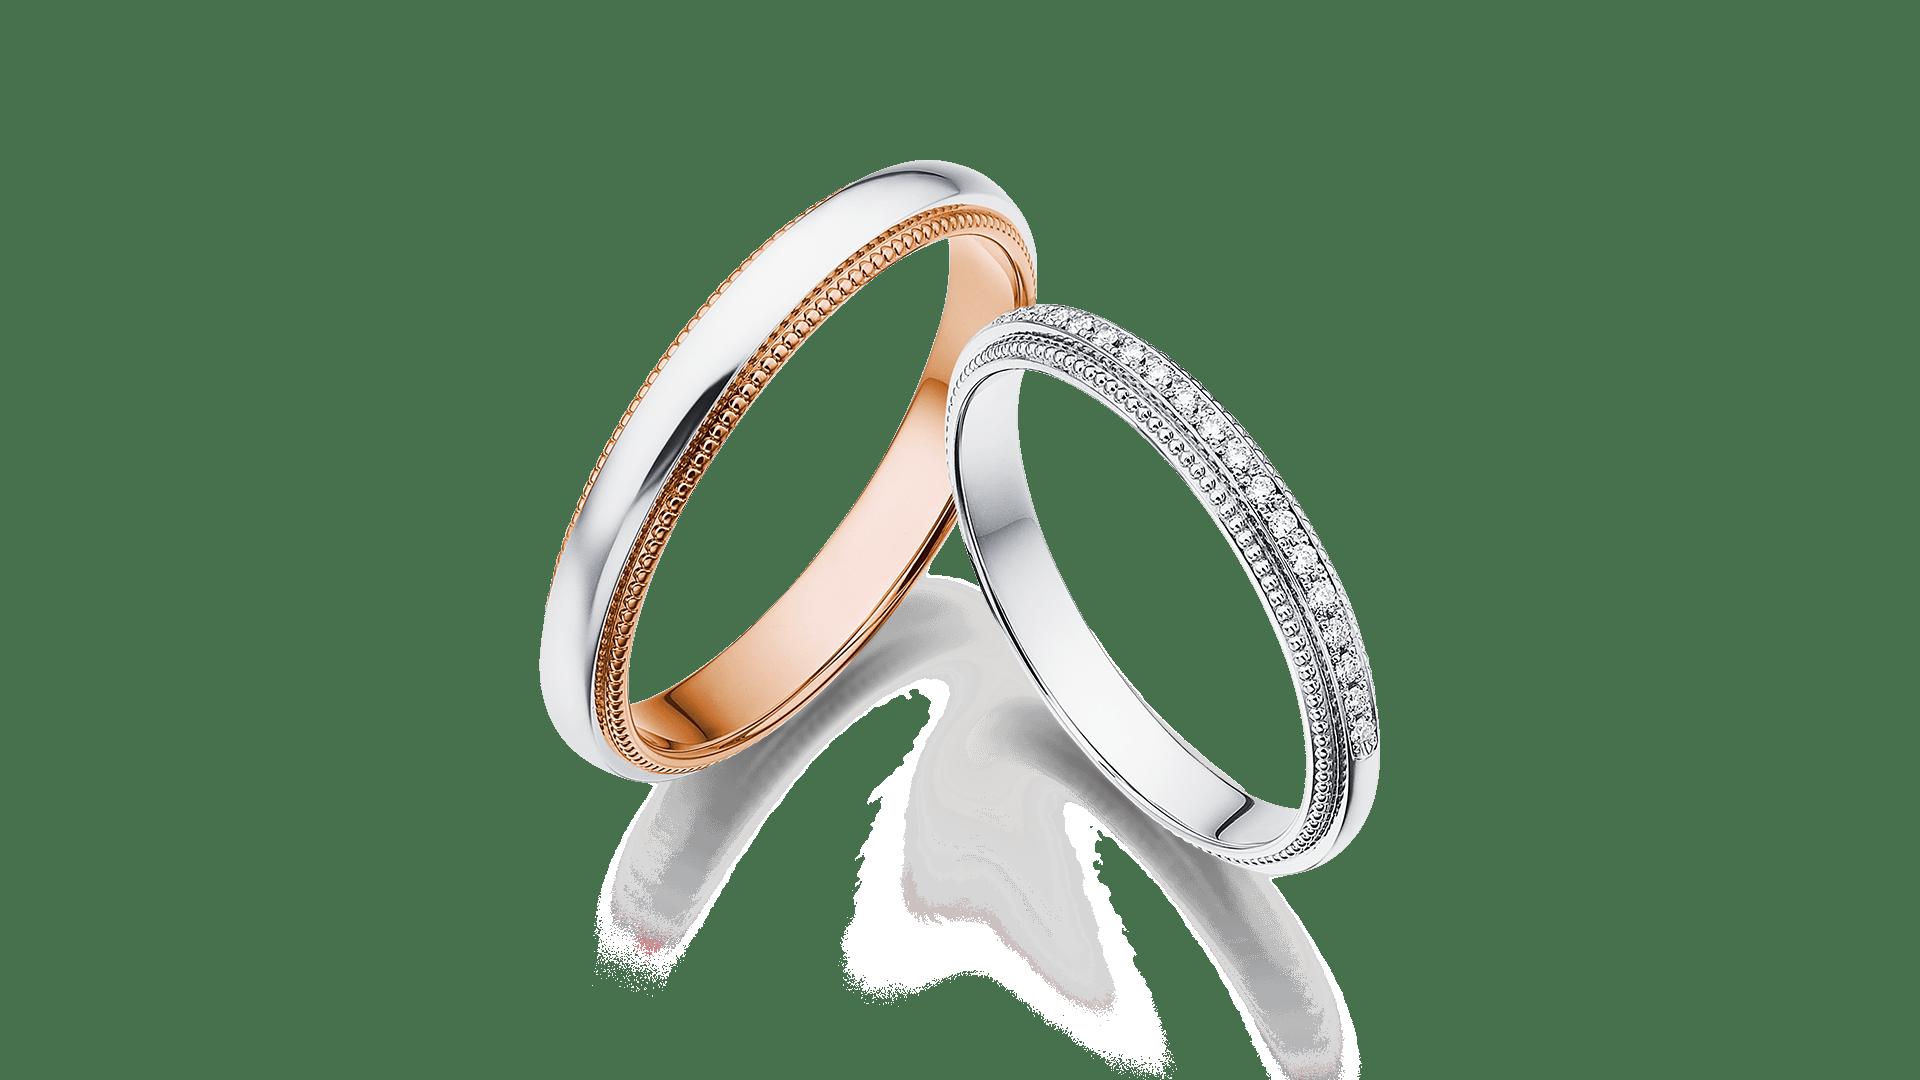 helios DR18 ヘリオスDR18 | 結婚指輪サムネイル 2